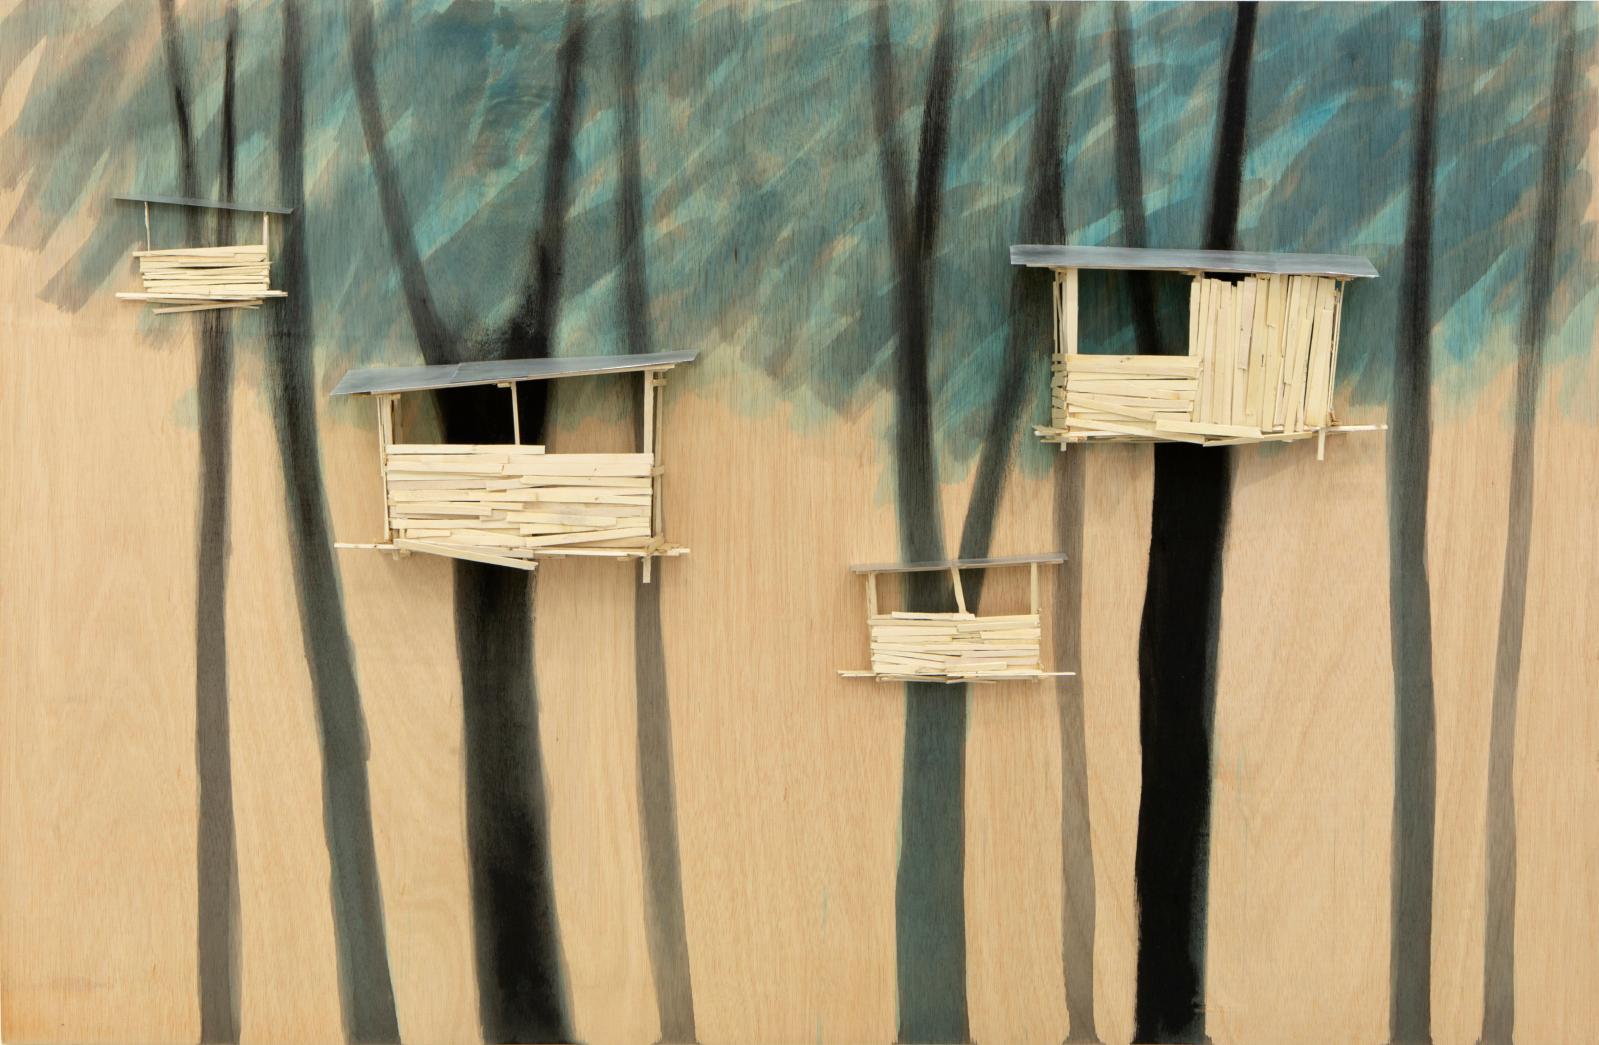 Tadashi Kawamata, Tree hut in Tremblay Plan no. 90, 2021, model in wood, glue and paint, 100 x 153 x 12 cm/39.4 x 60.2 x 4.7 in.© Tadashi